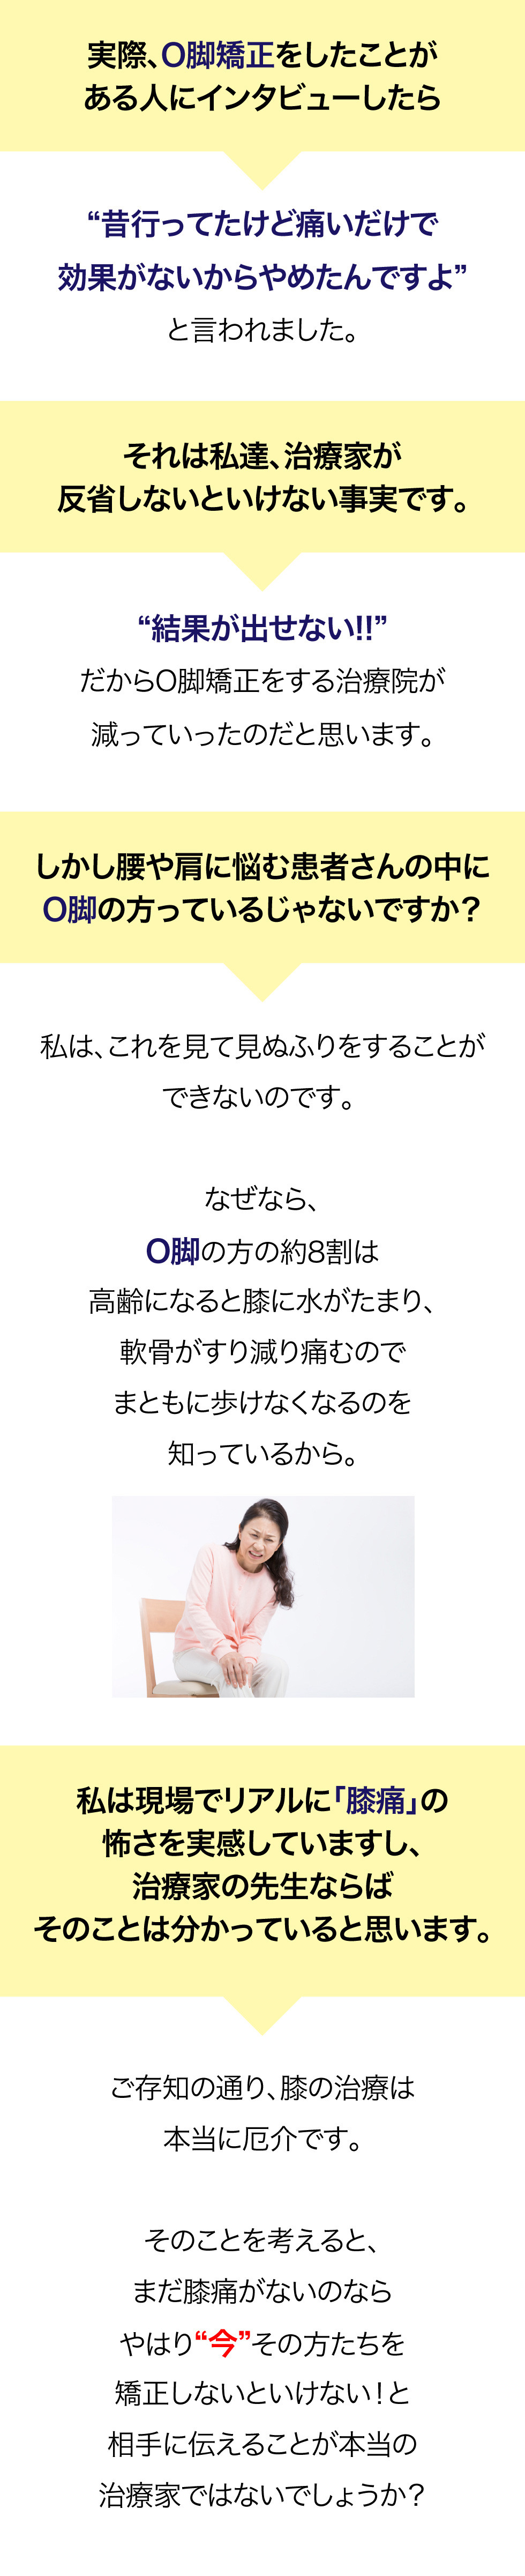 LP_野島式O脚矯正マスター講座_動画購入ページ_200107-02.jpg